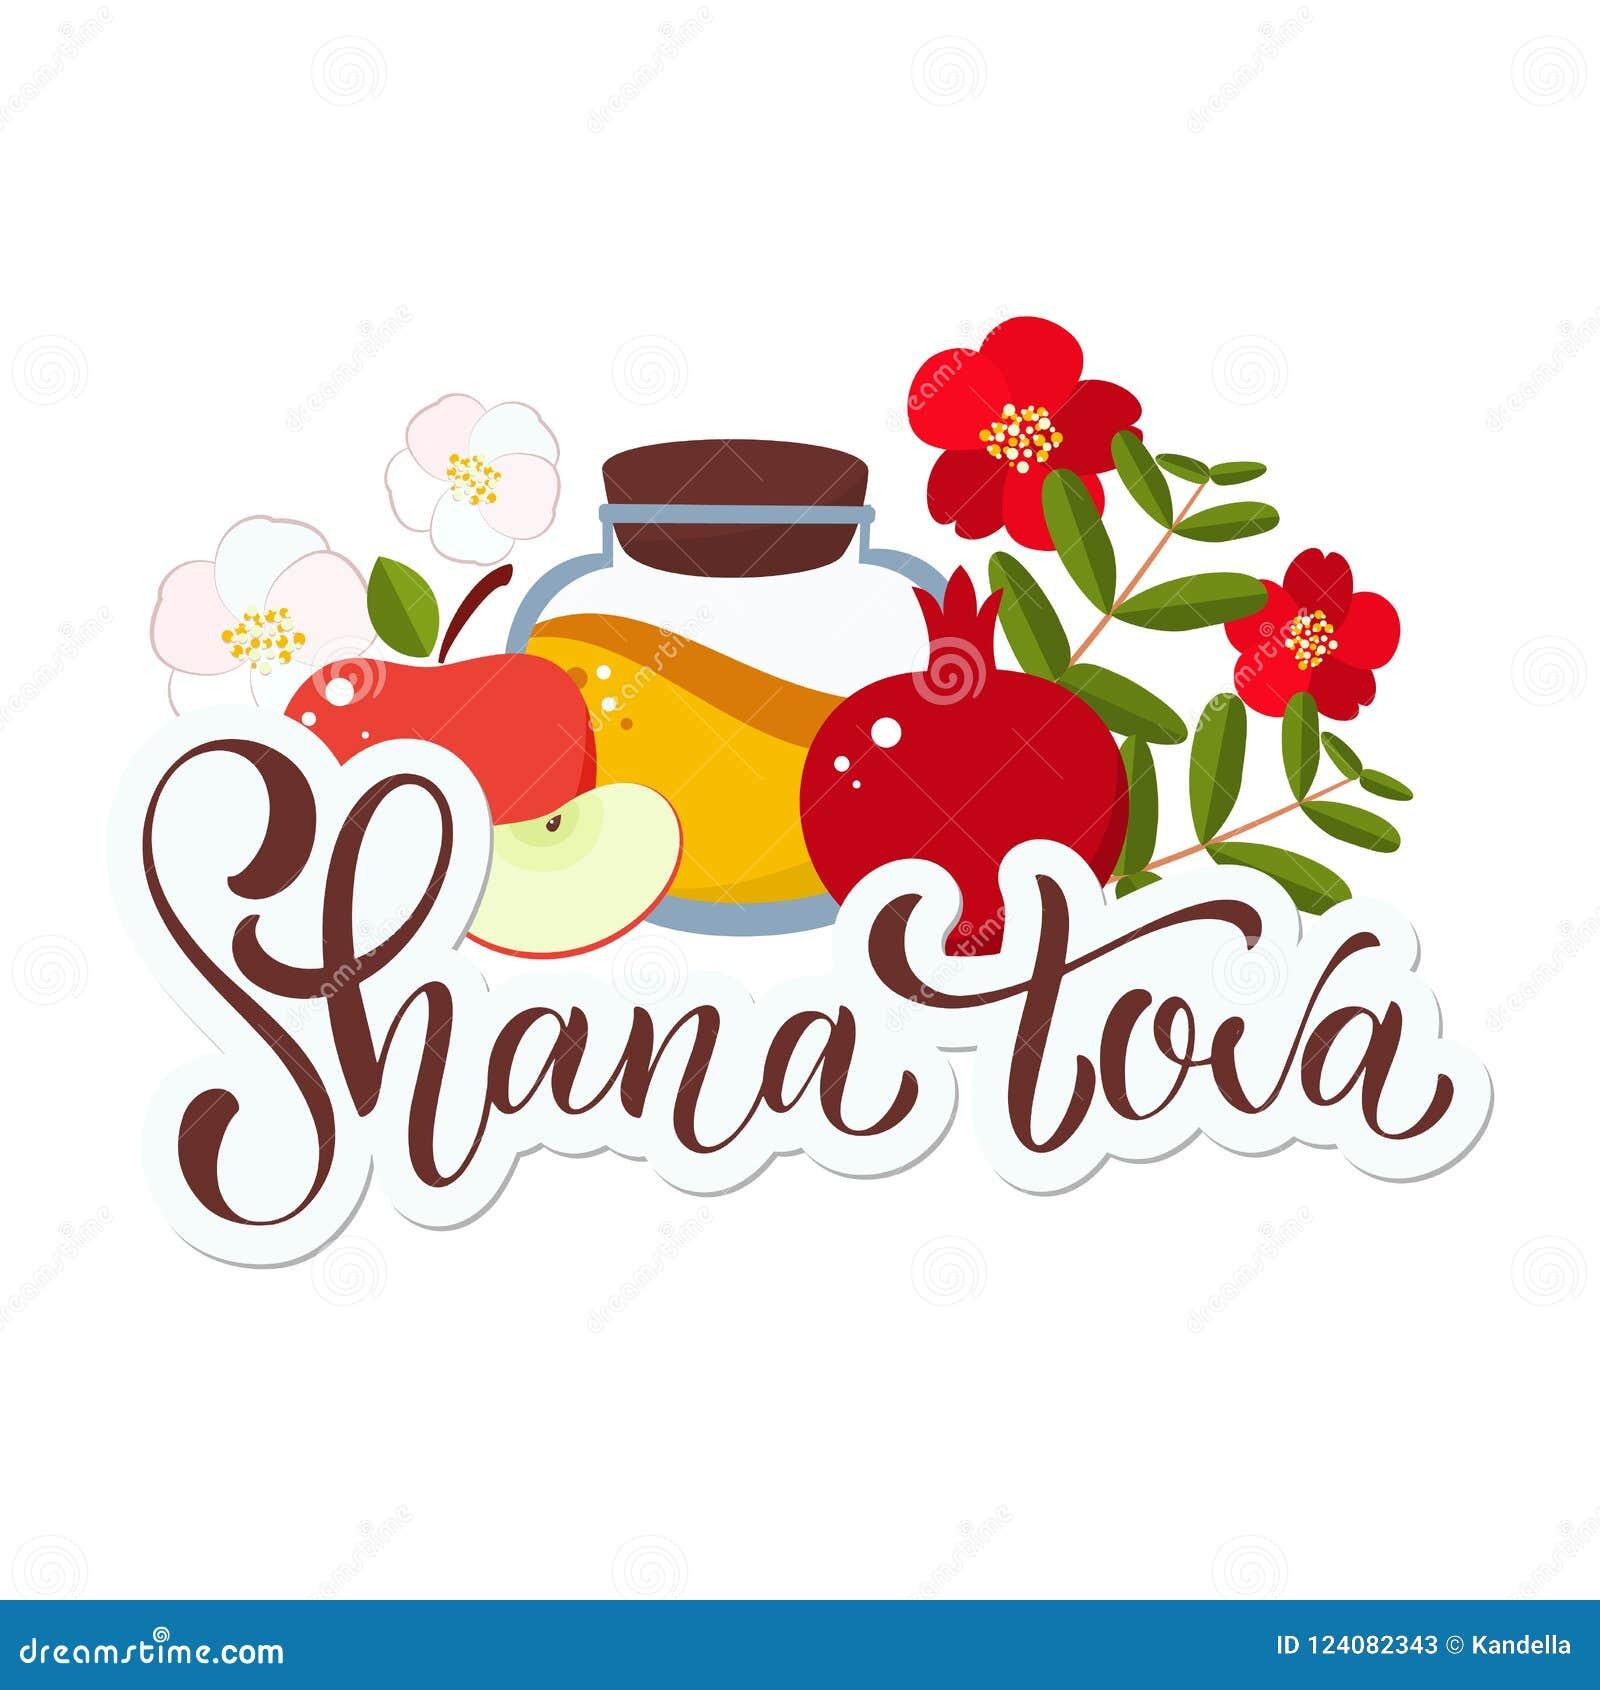 Shana Tova Calligraphy Text For Jewish New Year. Stock Vector ...